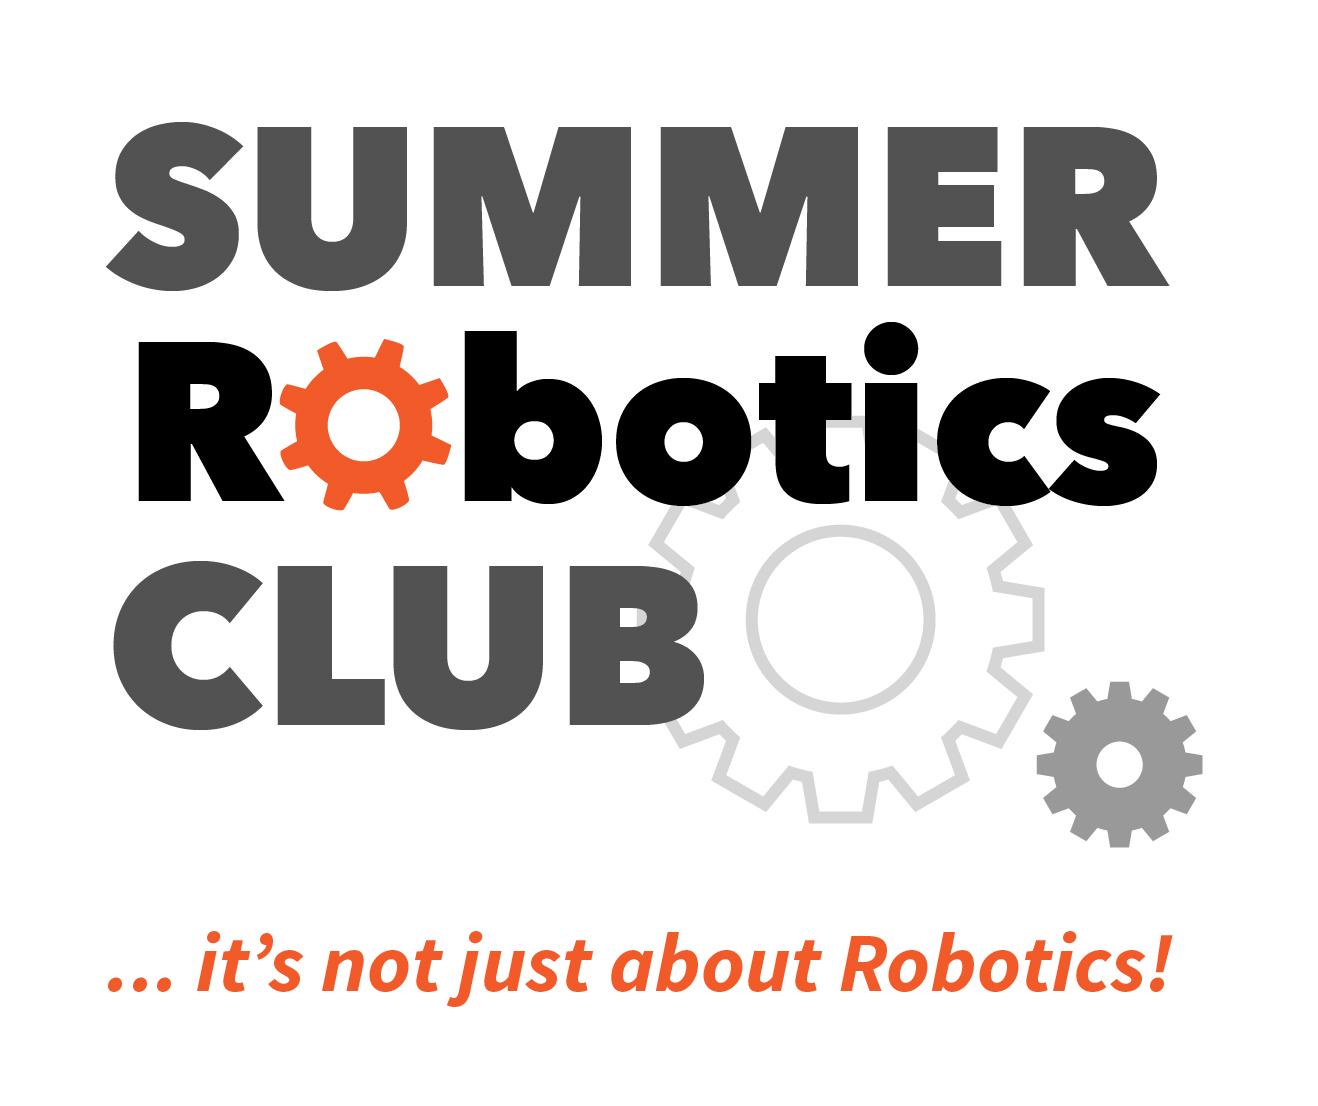 Summer Robotics Club